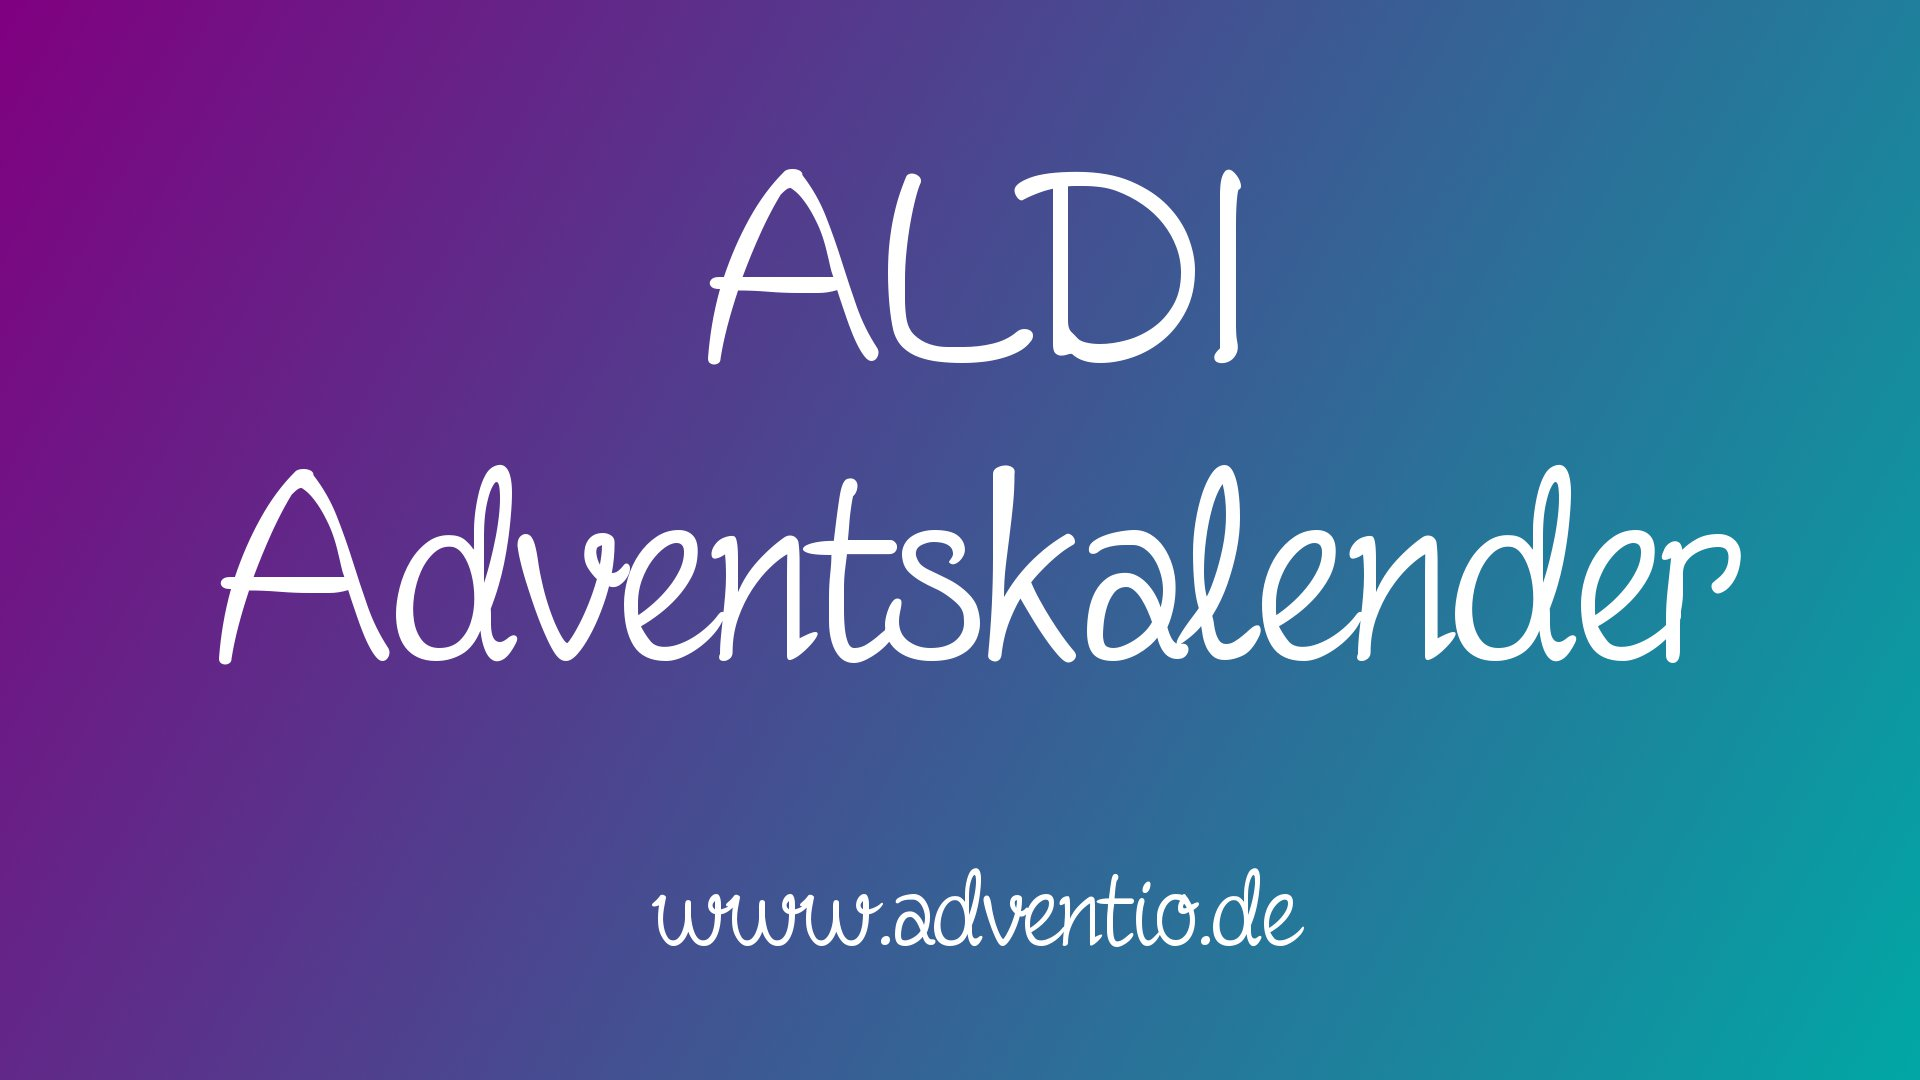 ALDI Adventskalender